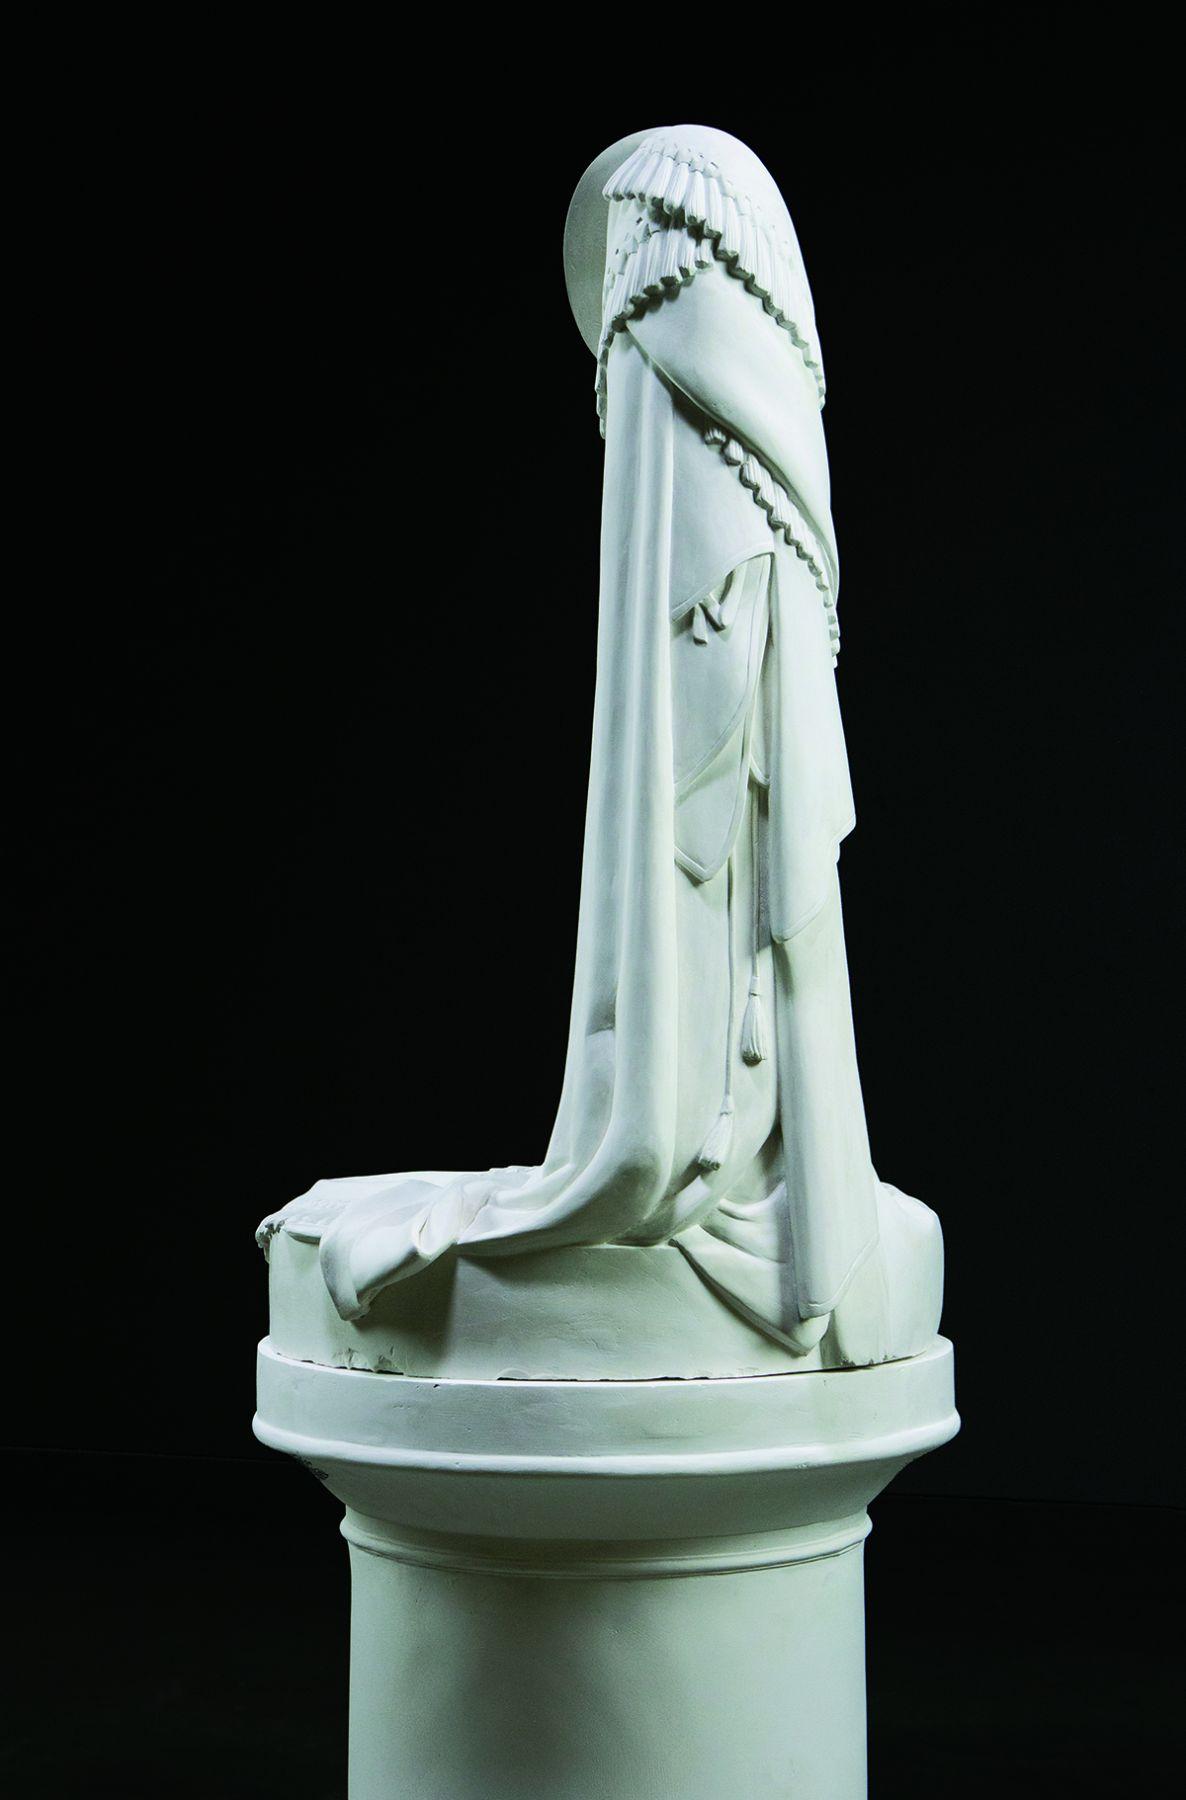 Lily Cox-Richard (b. 1979), The Stand: Greek Slave, 2013